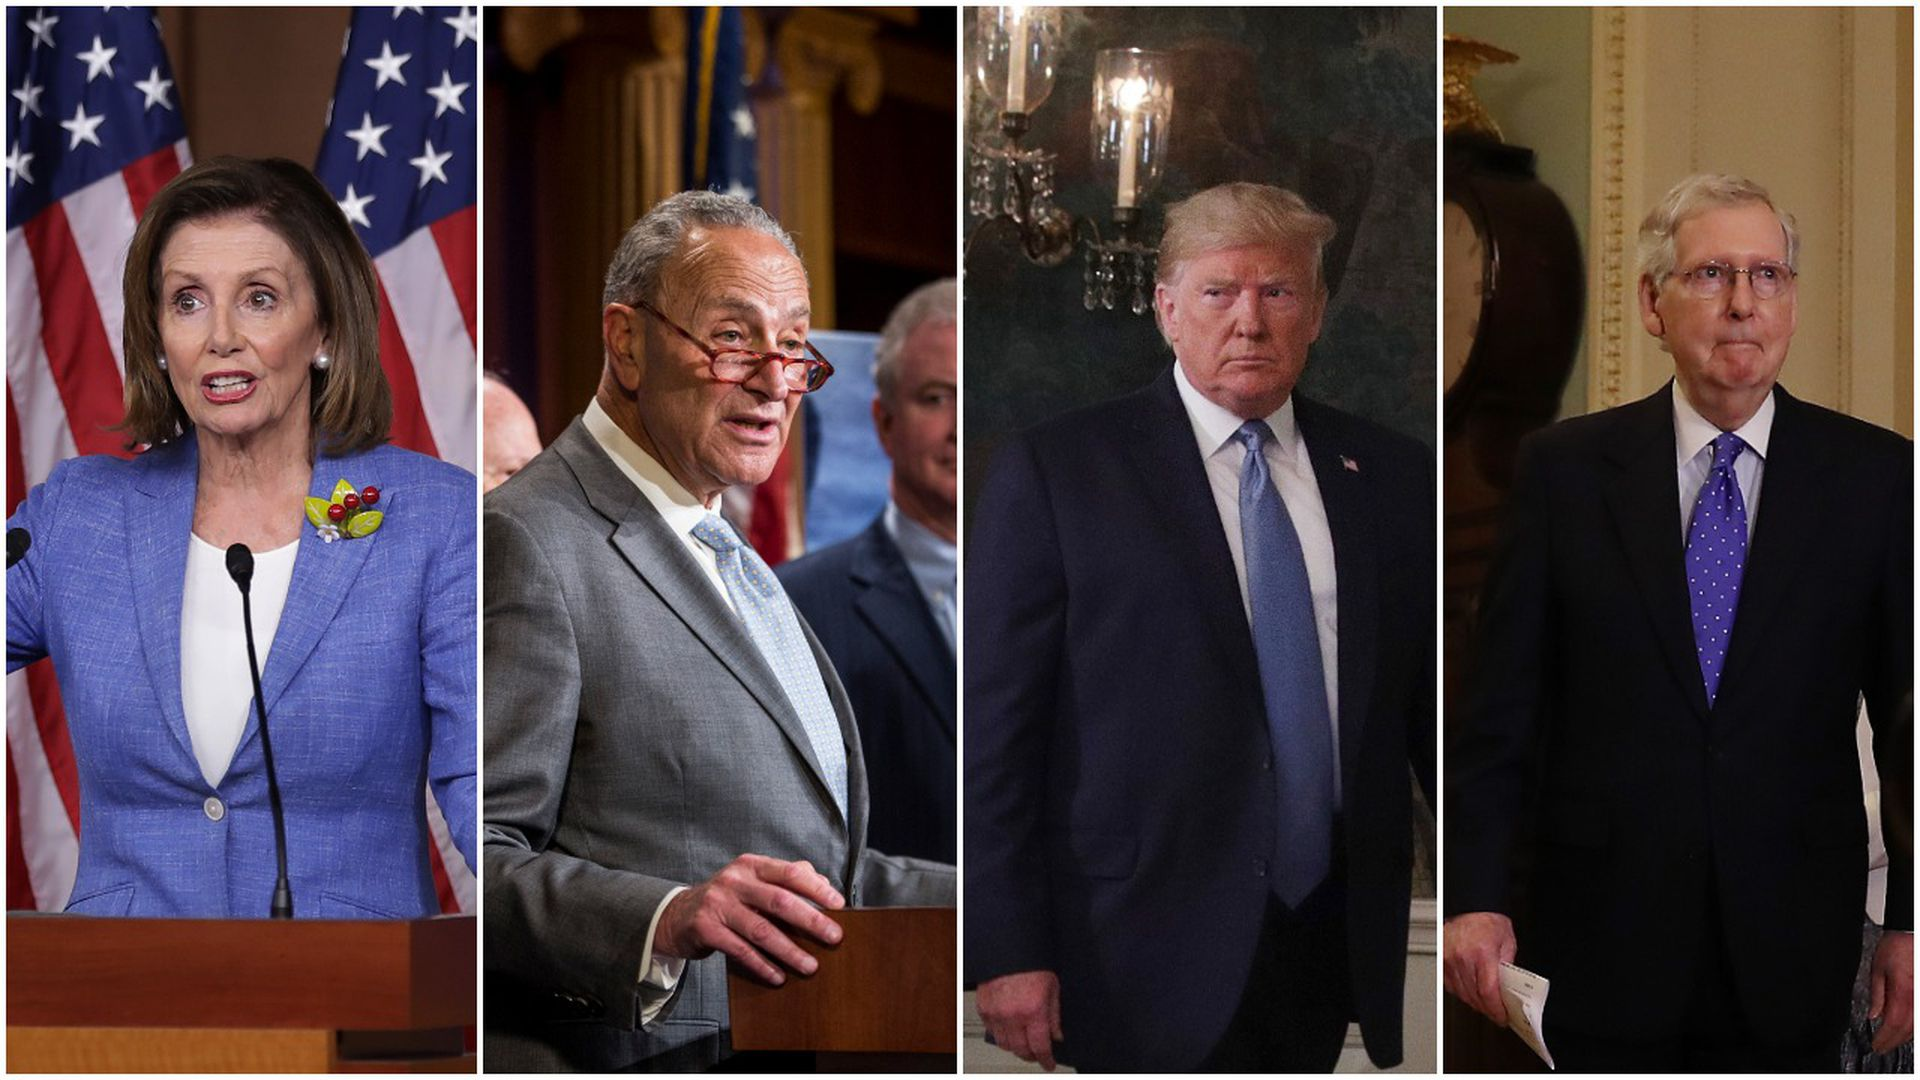 Nancy Pelosi, Chuck Schumer, President Trump and Mitch McConnell.